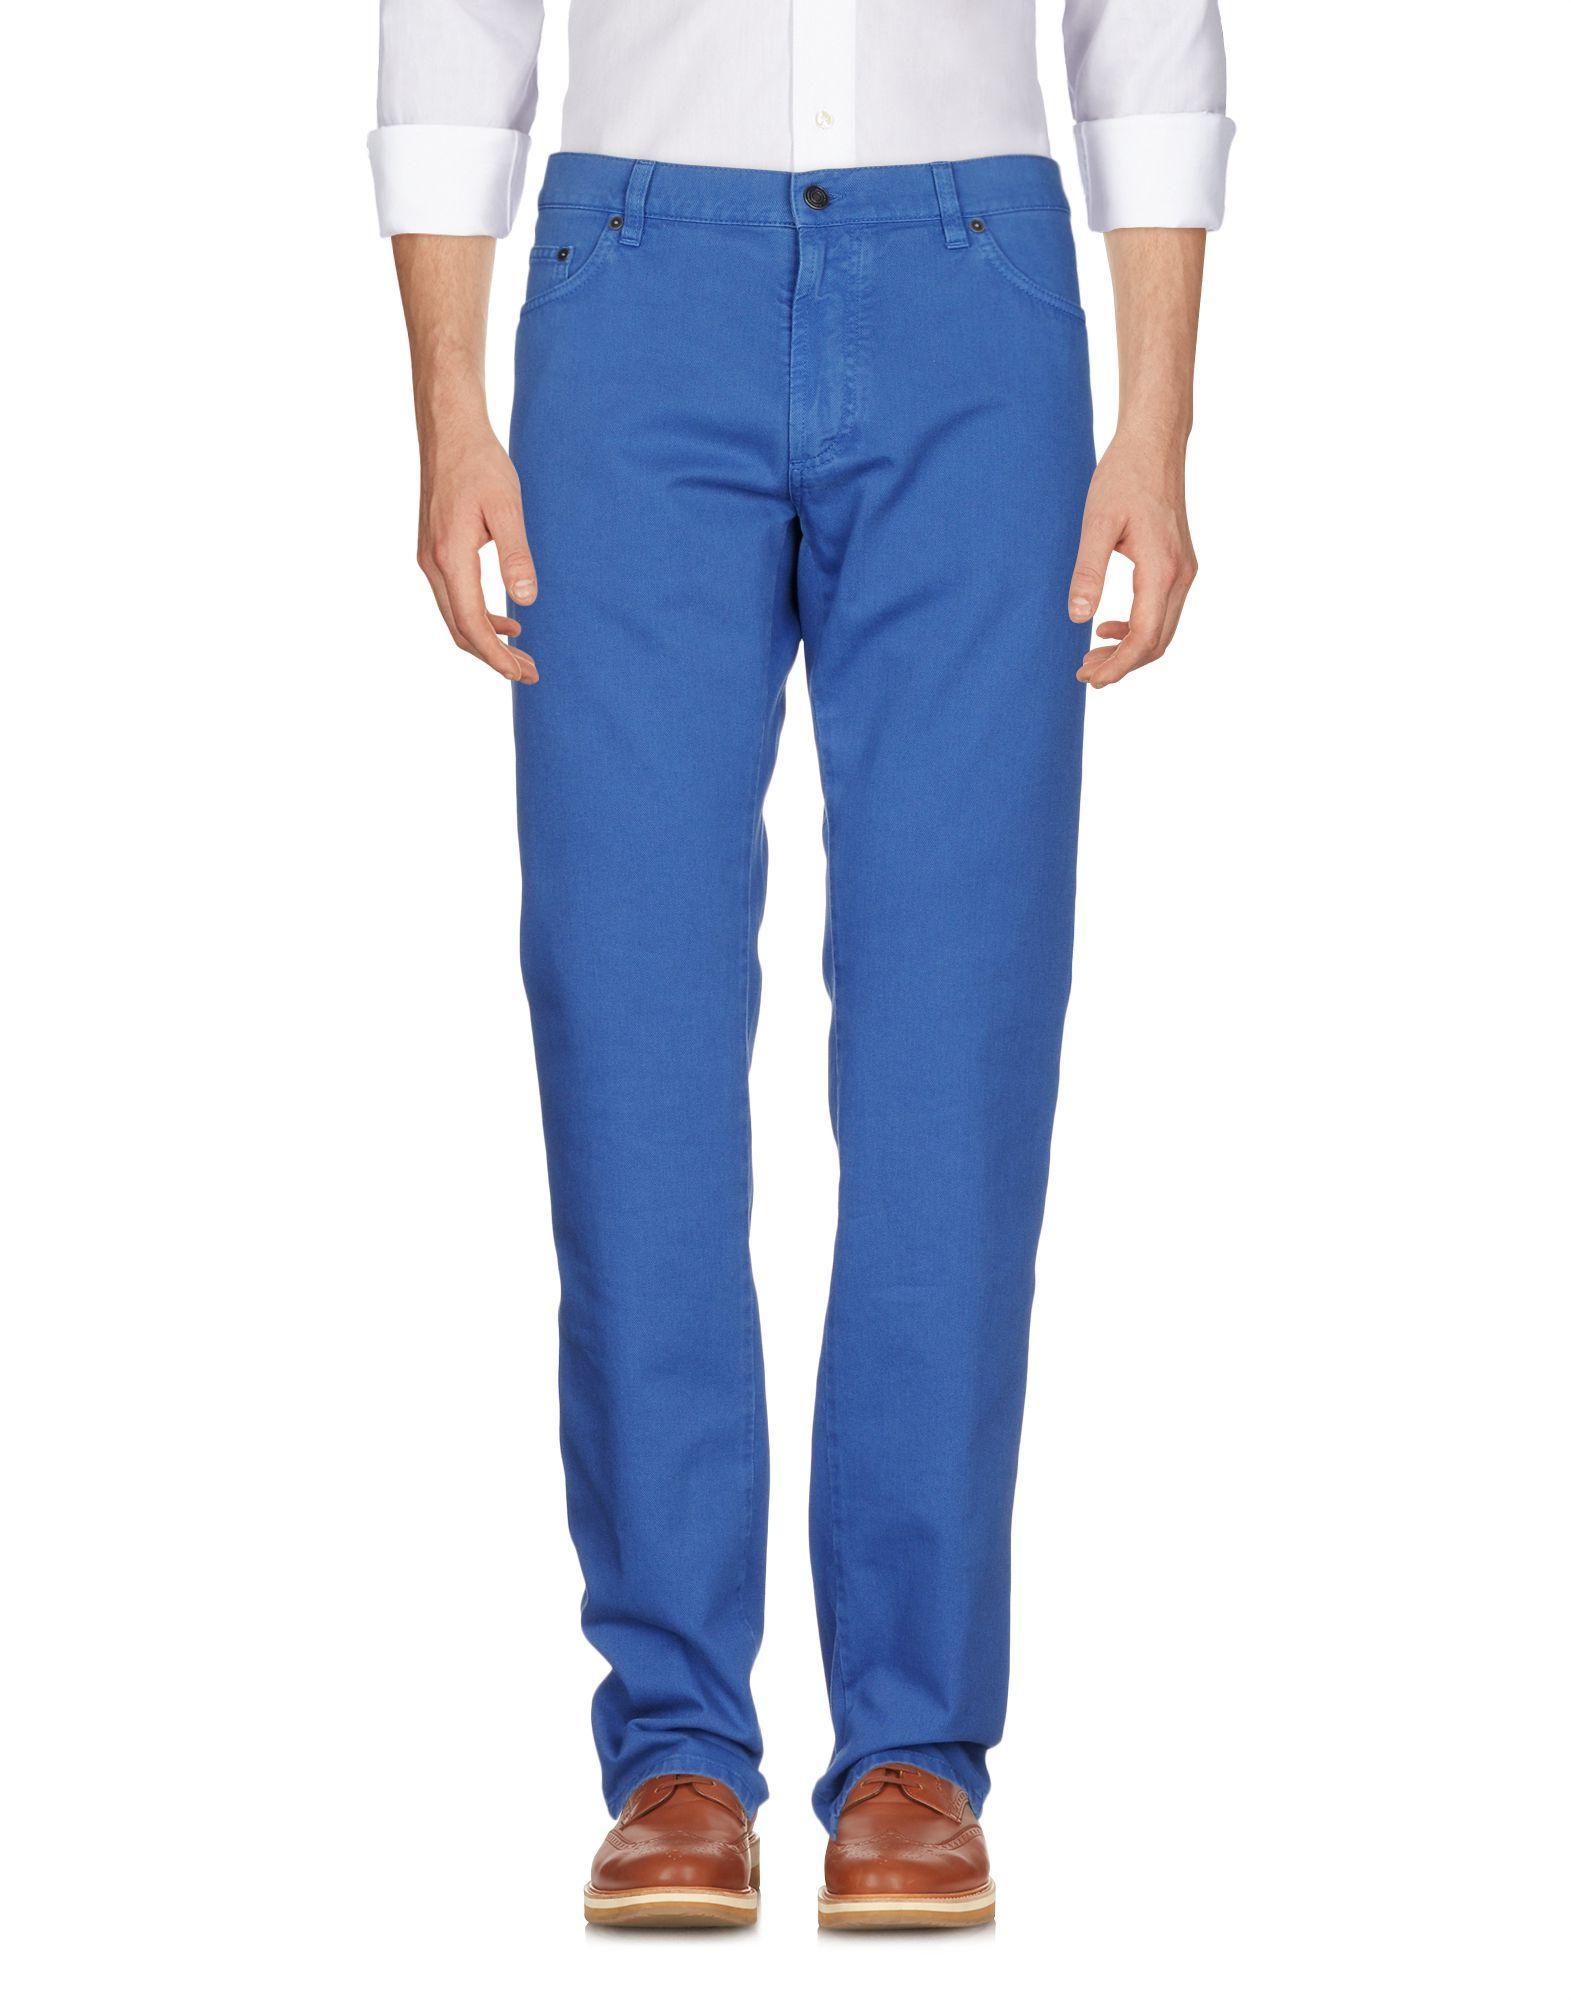 Salvatore Ferragamo Casual Pants In Blue